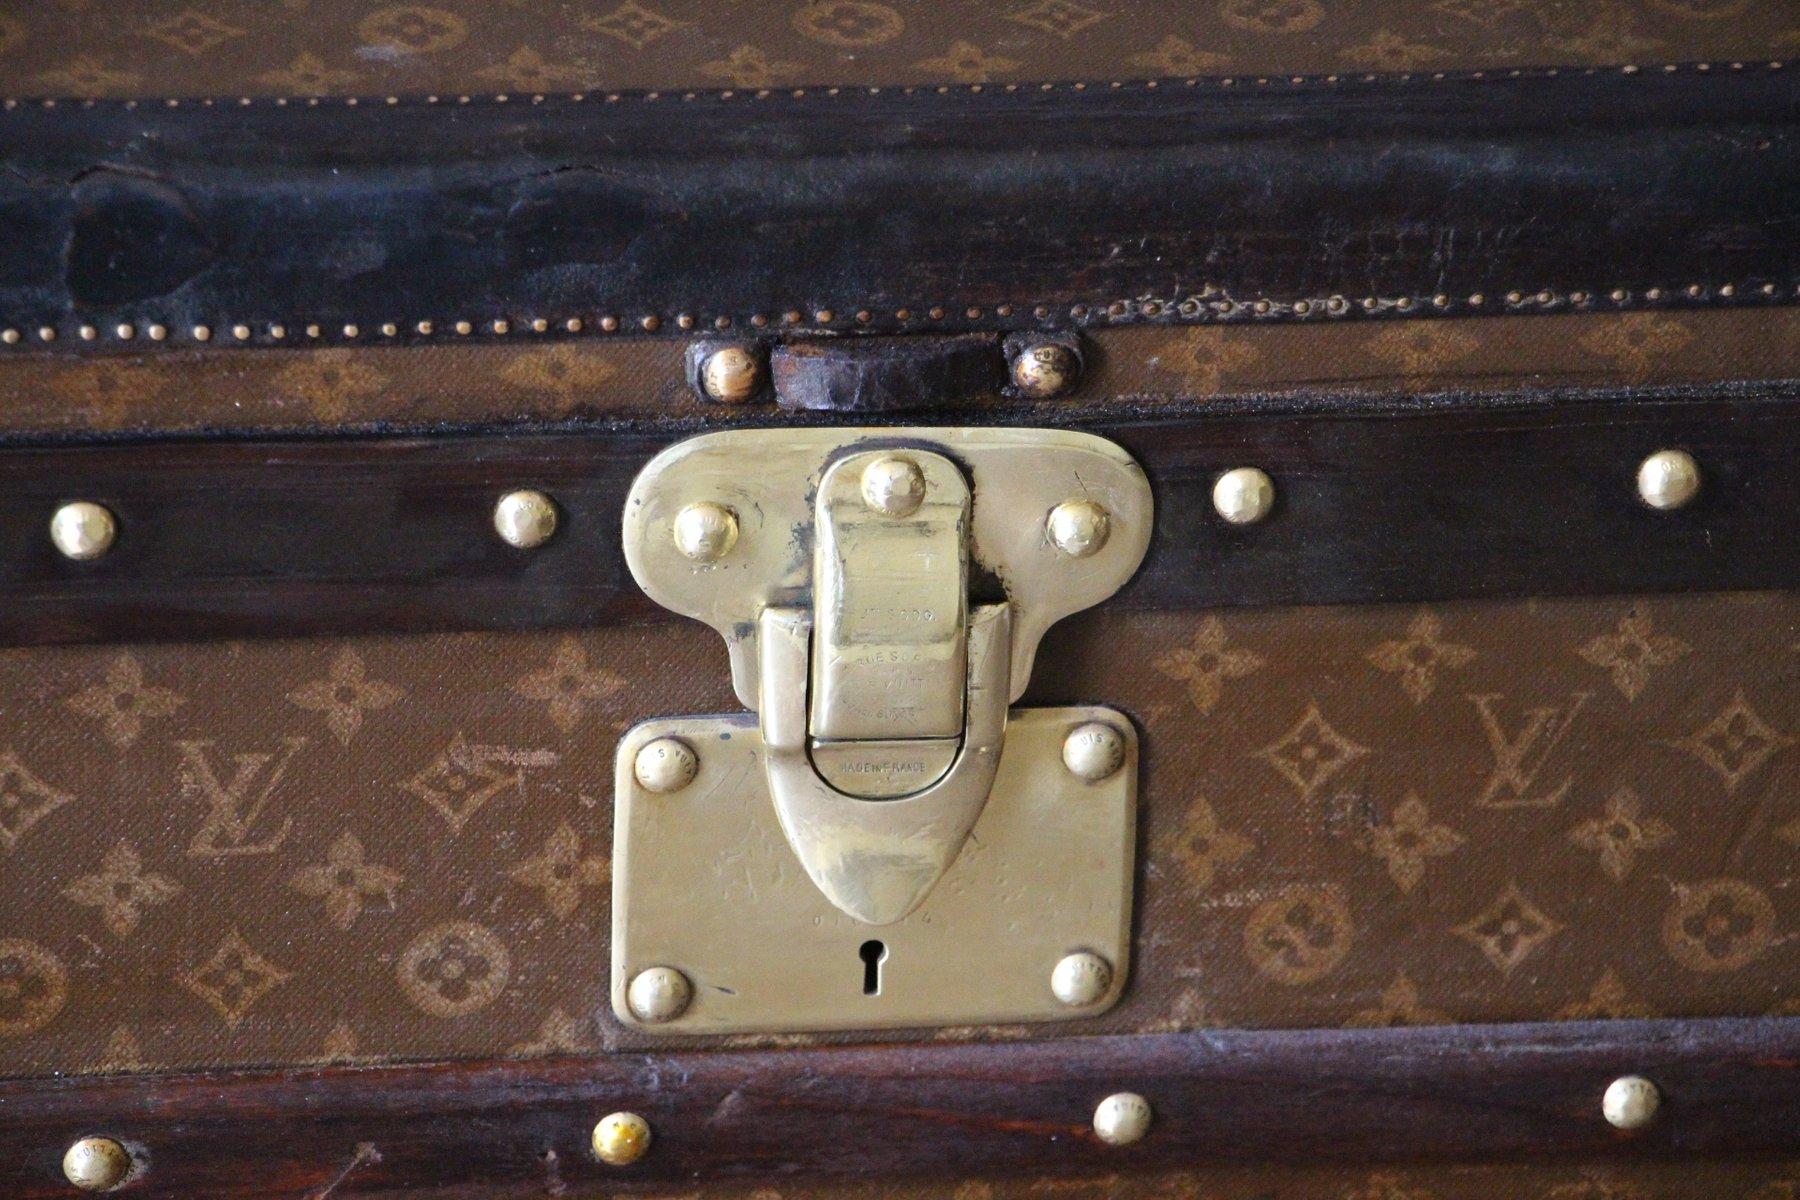 malle de voyage stenciled monogramm vintage de louis vuitton en vente sur pamono. Black Bedroom Furniture Sets. Home Design Ideas